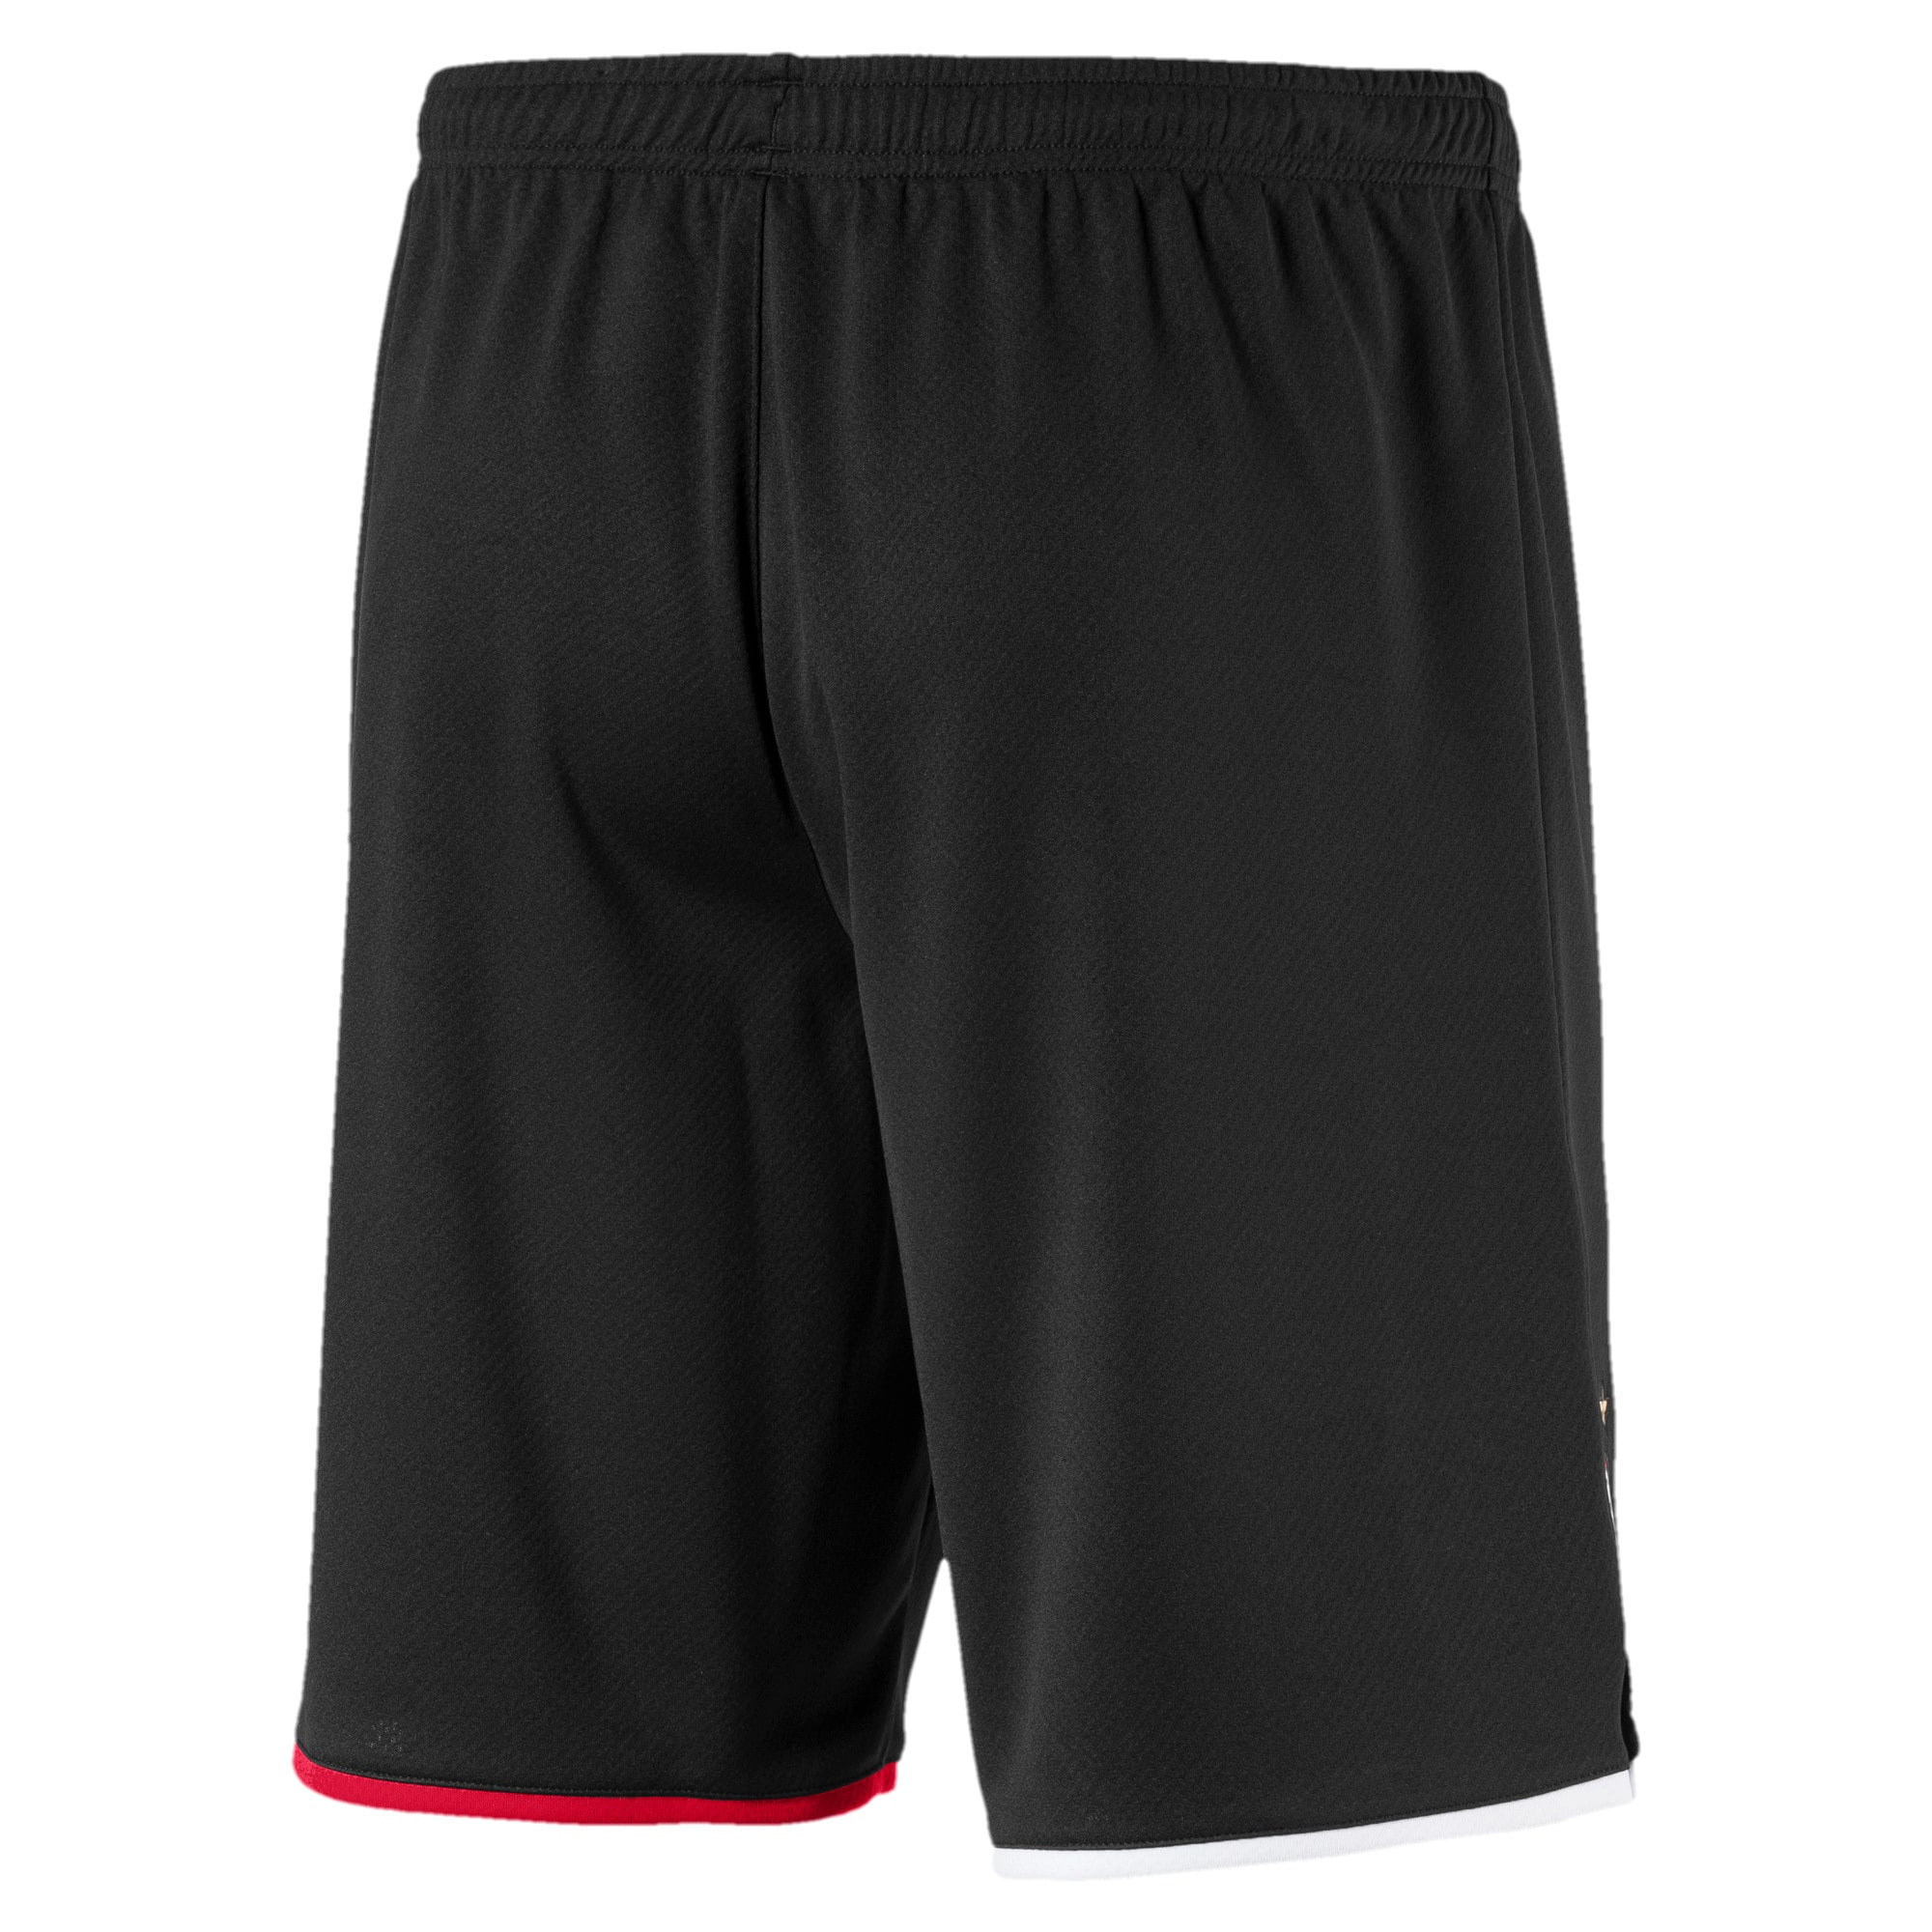 Thumbnail 2 of AC Milan Men's Away Replica Shorts, Puma Black-Tango Red, medium